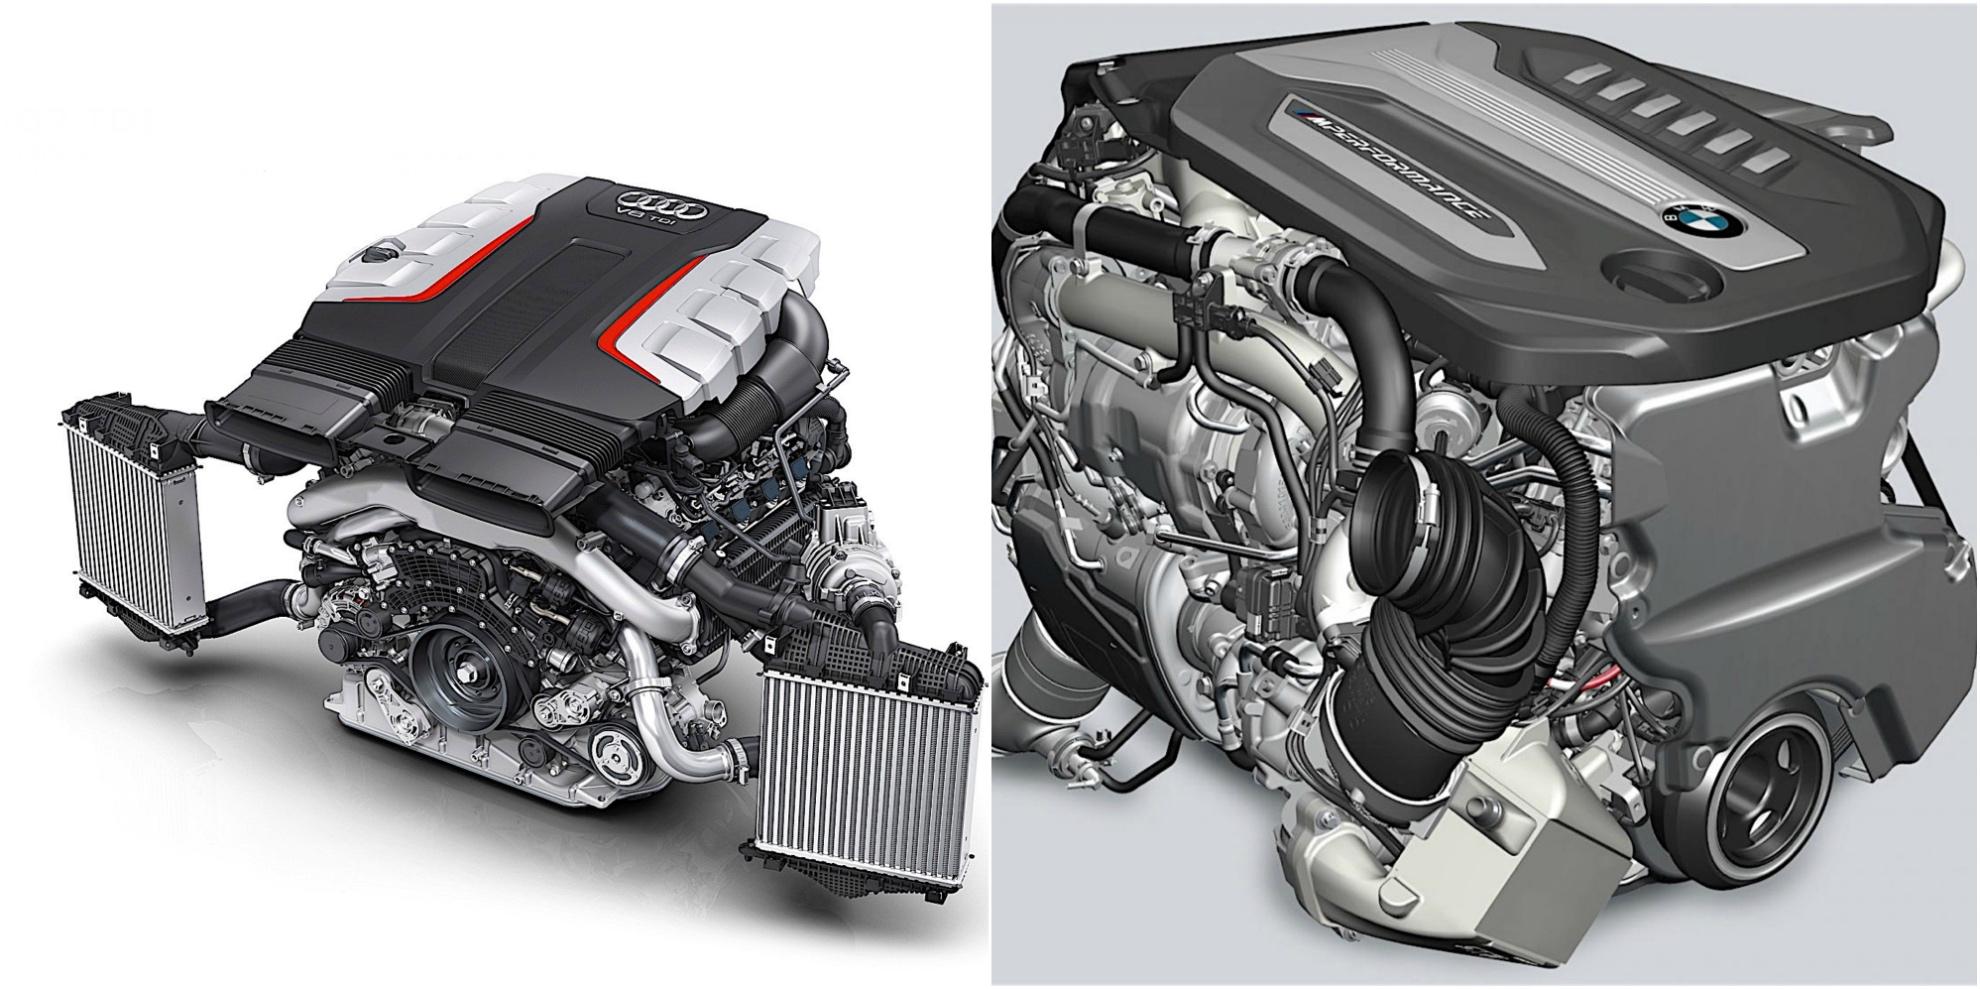 bmw versus audi the multi turbo diesel engine battle. Black Bedroom Furniture Sets. Home Design Ideas